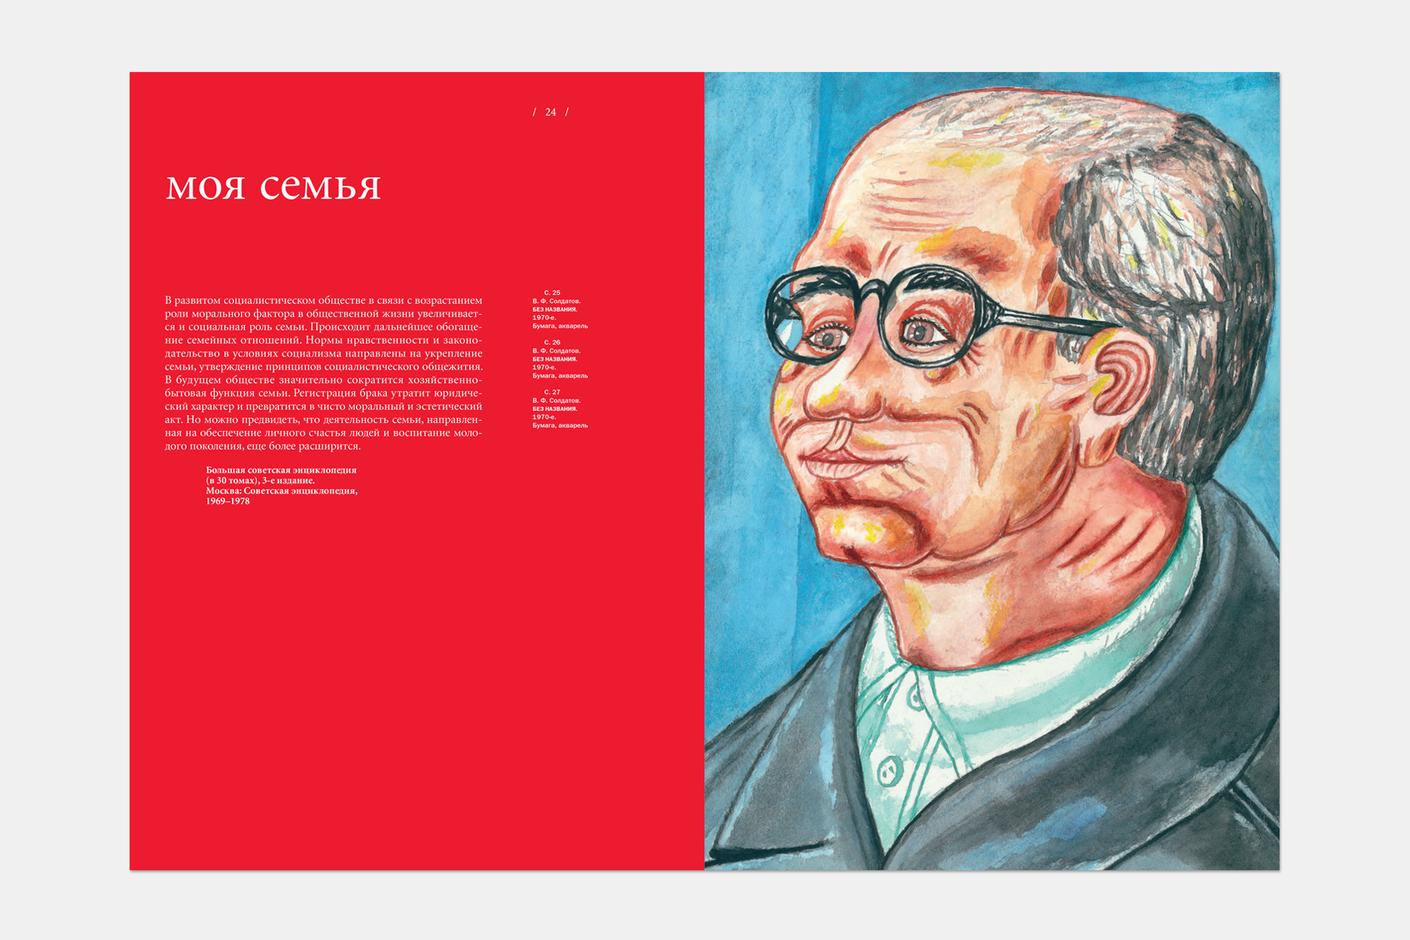 Музей «Магнезит» заказал у лаборатории дизайна НИУ ВШЭ проект - hsedesignlab.ru